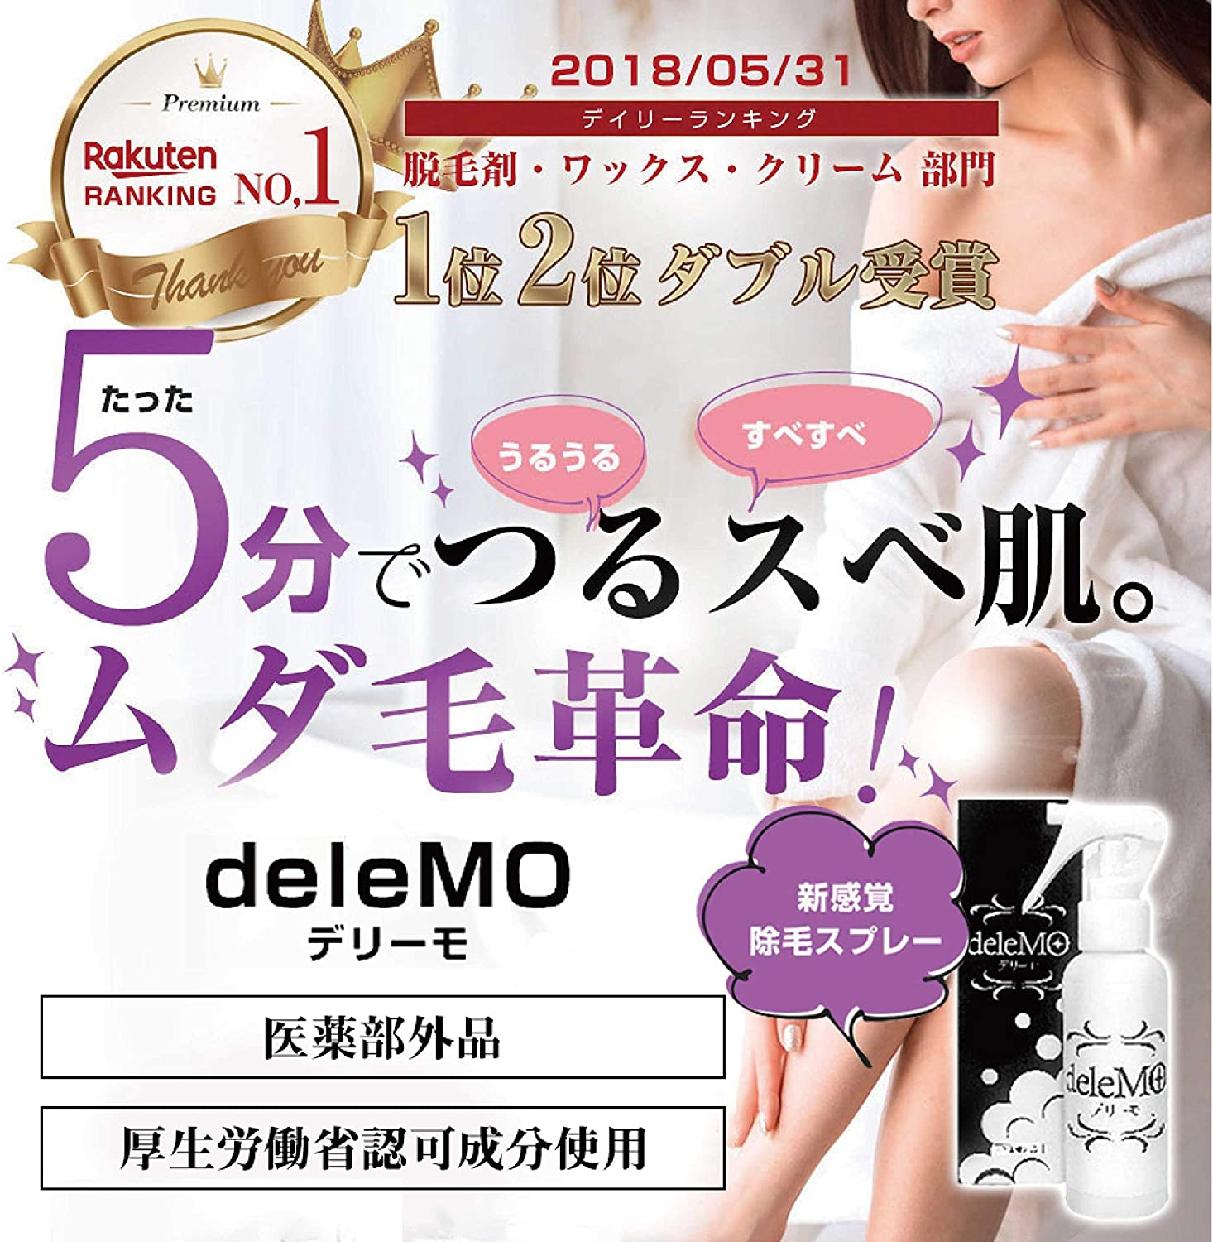 deleMO(デリーモ)deleMOの商品画像2